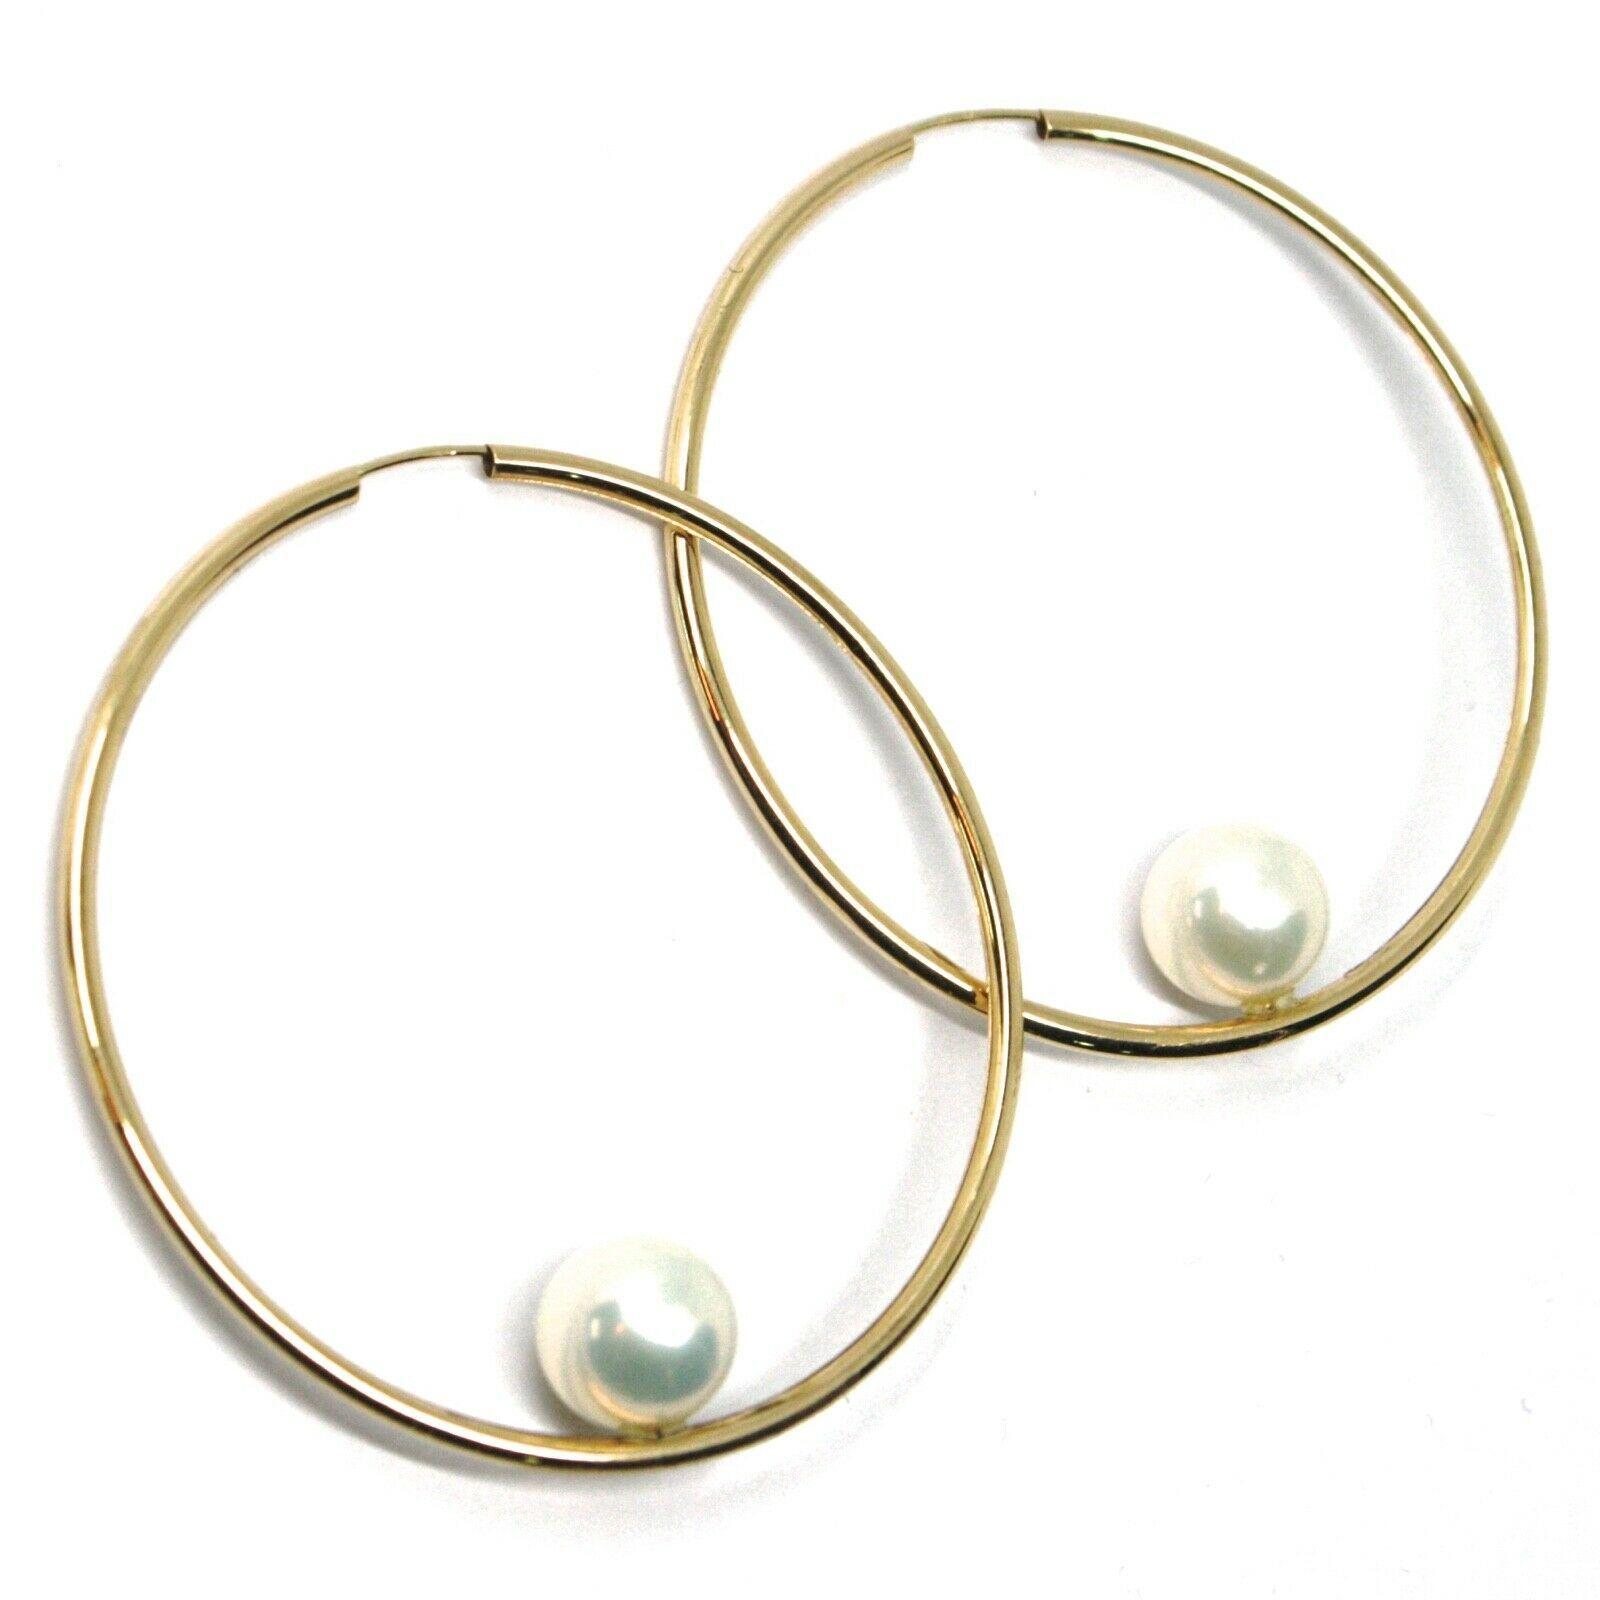 18K YELLOW GOLD CIRCLE HOOPS EARRINGS, TUBE 1.5mm, DIAMETER 5cm, HANGING PEARL